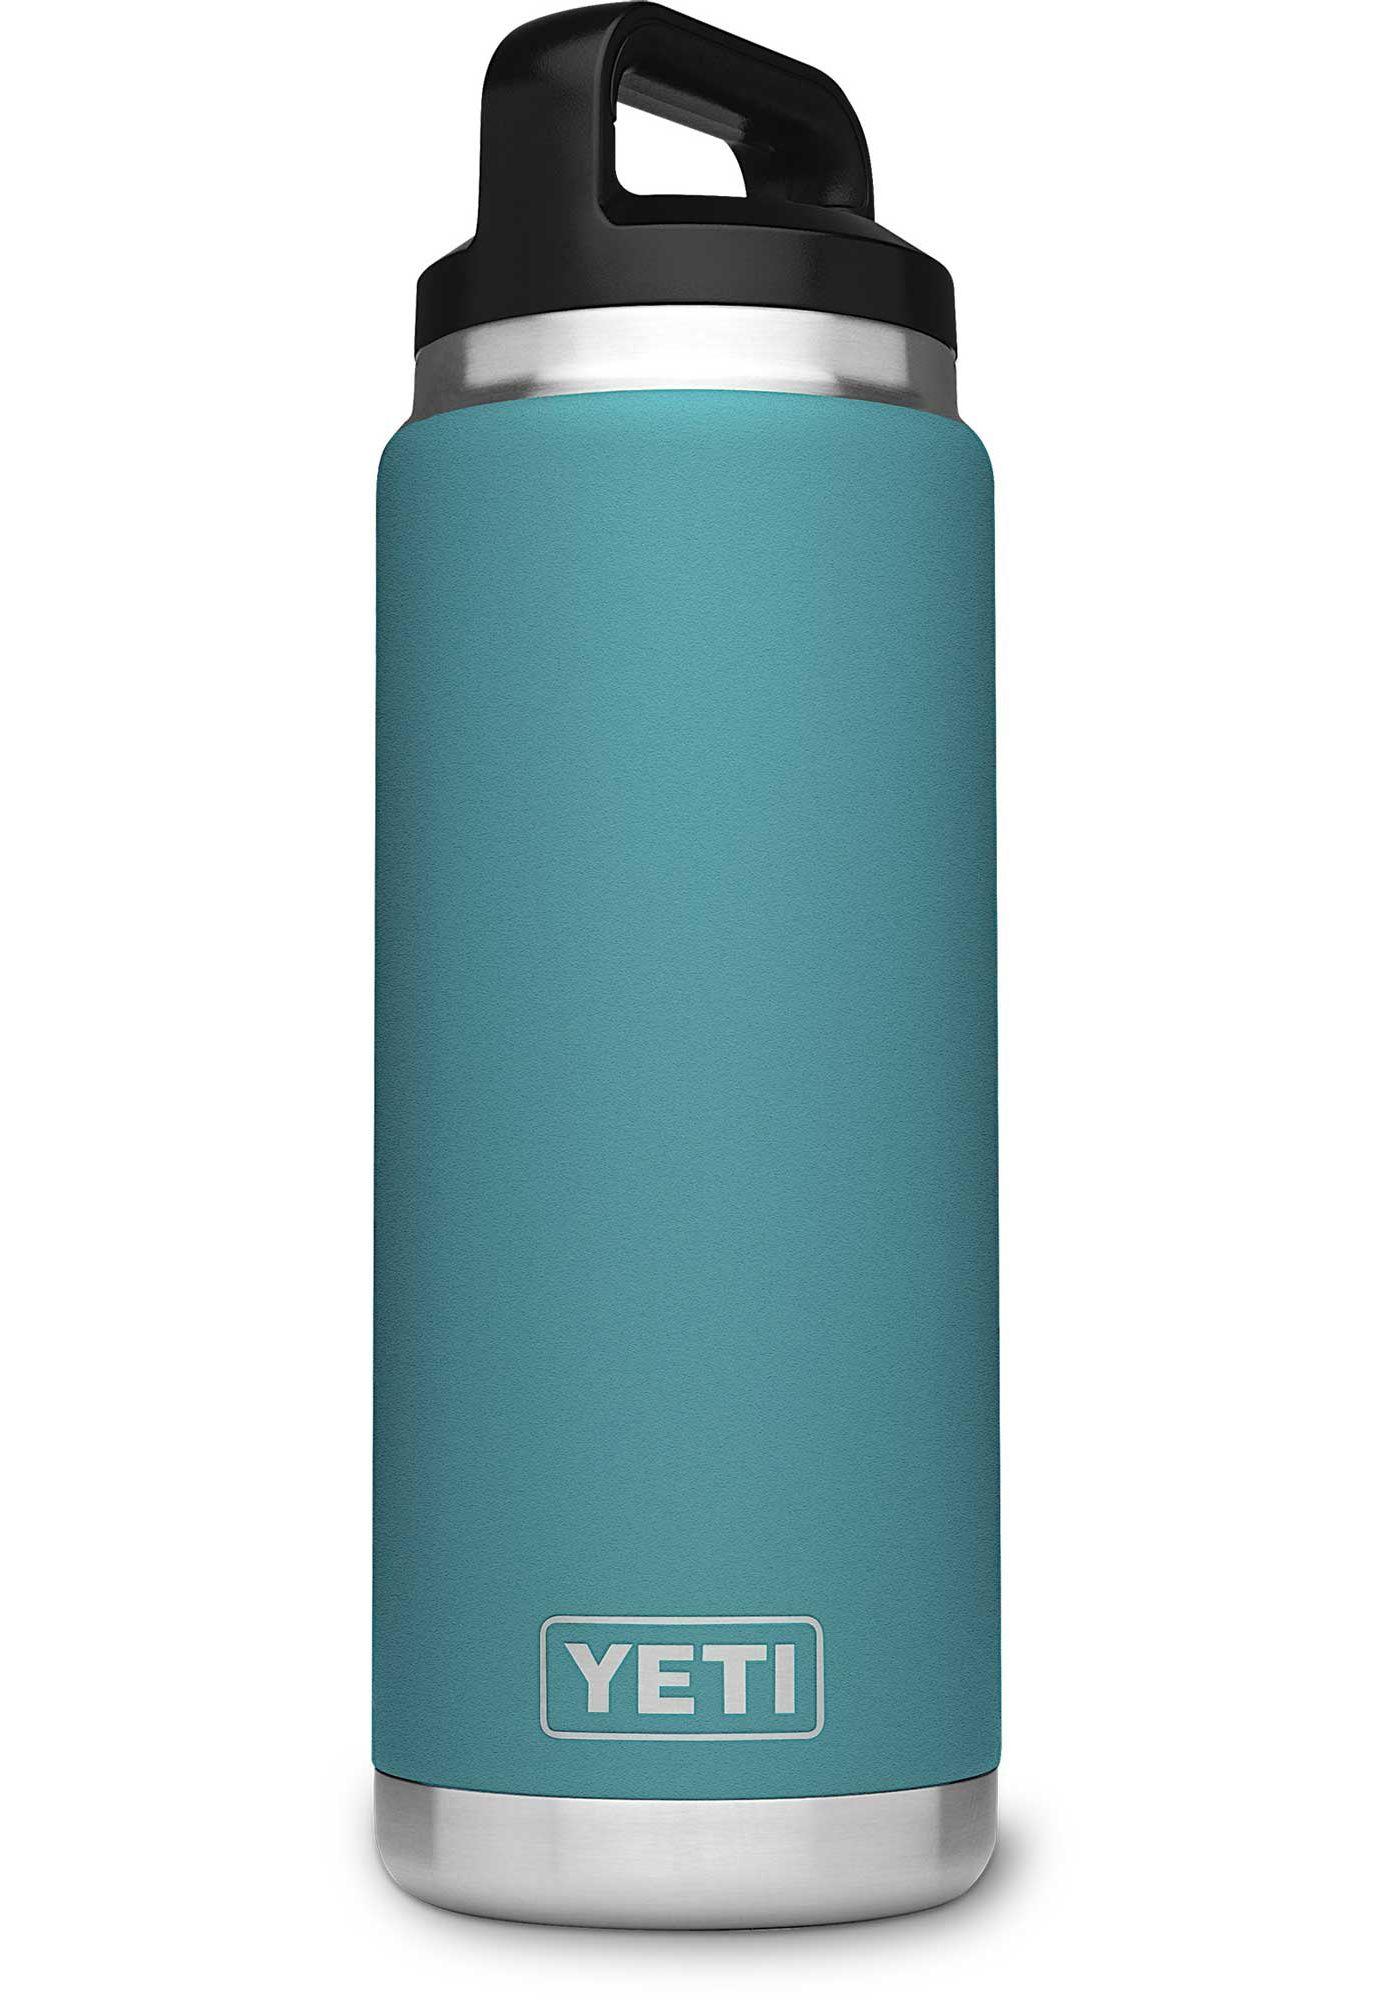 2-Count 26oz Yeti Rambler Water Bottle $49.98 + Free Shipping